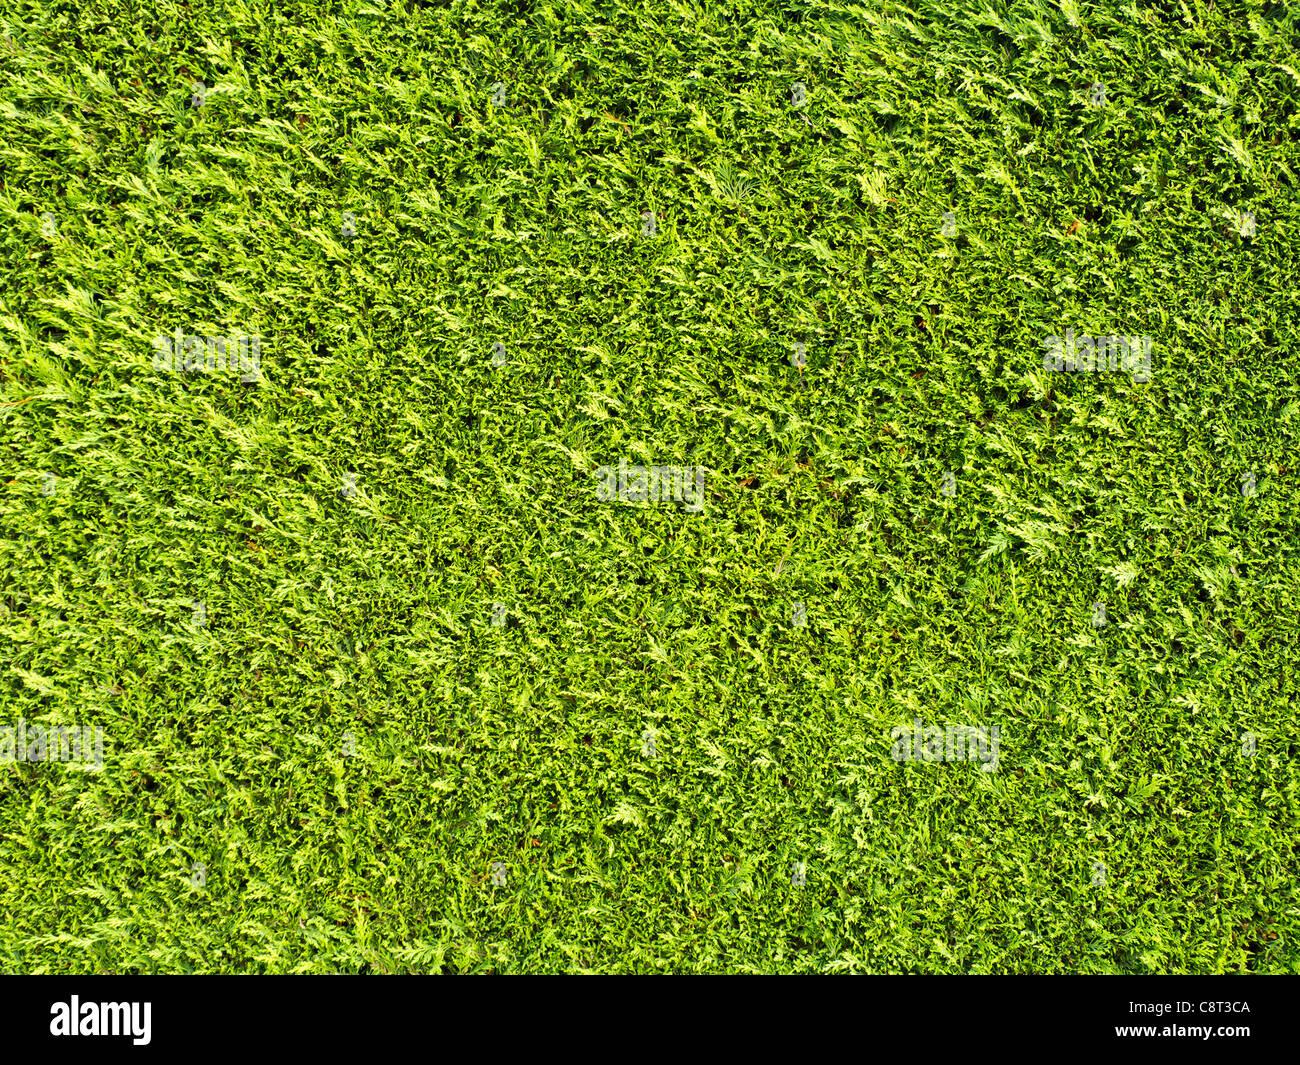 Siepe Texture Foto Immagine Stock 39867530 Alamy